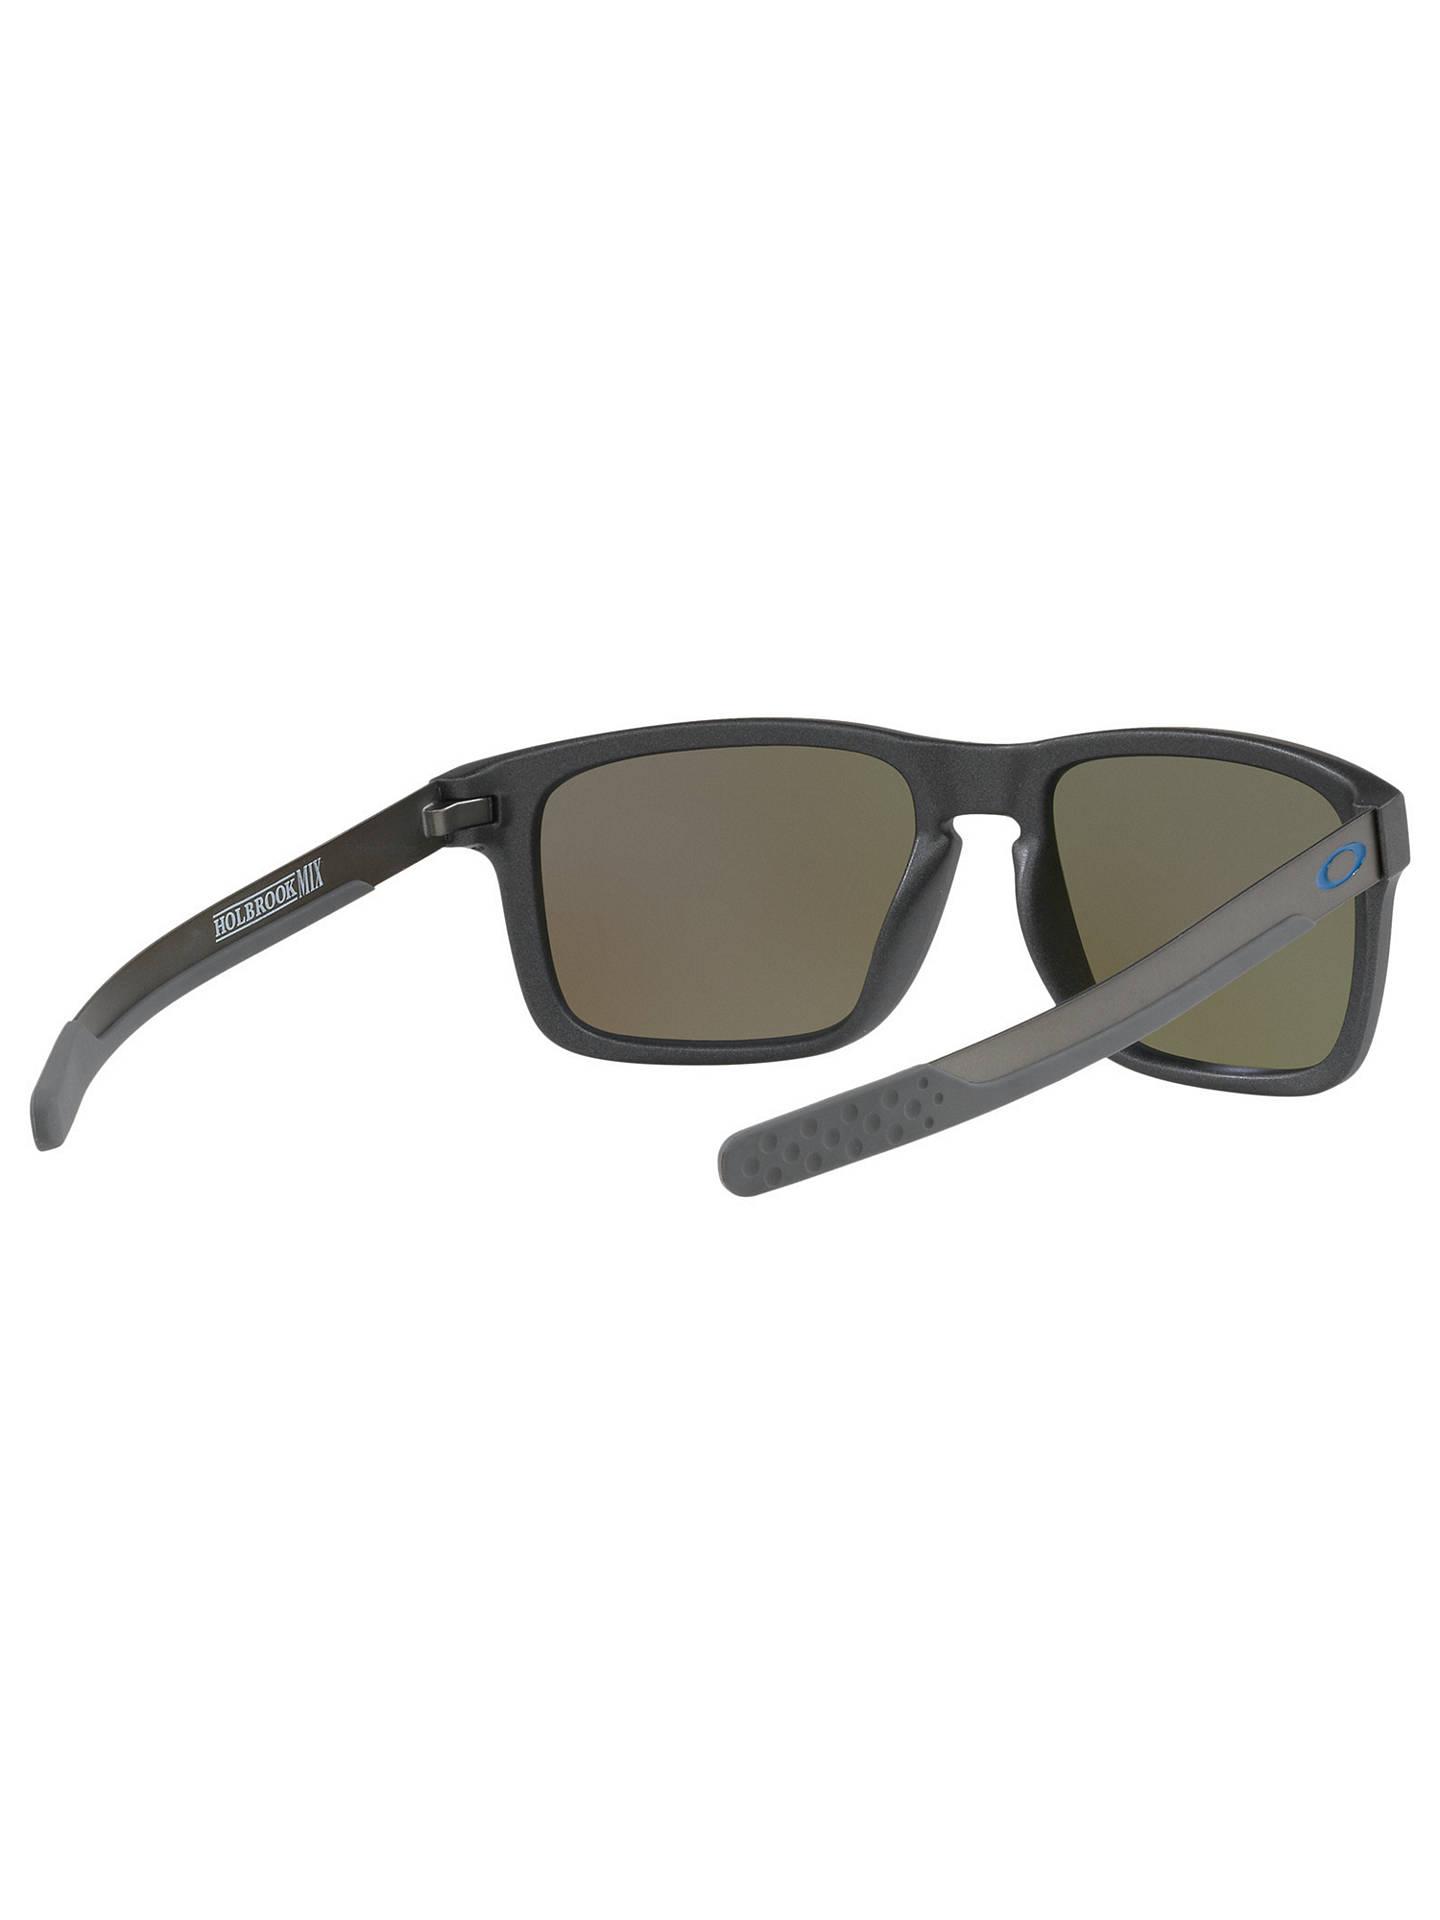 a2b3bbf307b8c ... Buy Oakley OO9384 Holbrook Prizm Polarised Sunglasses